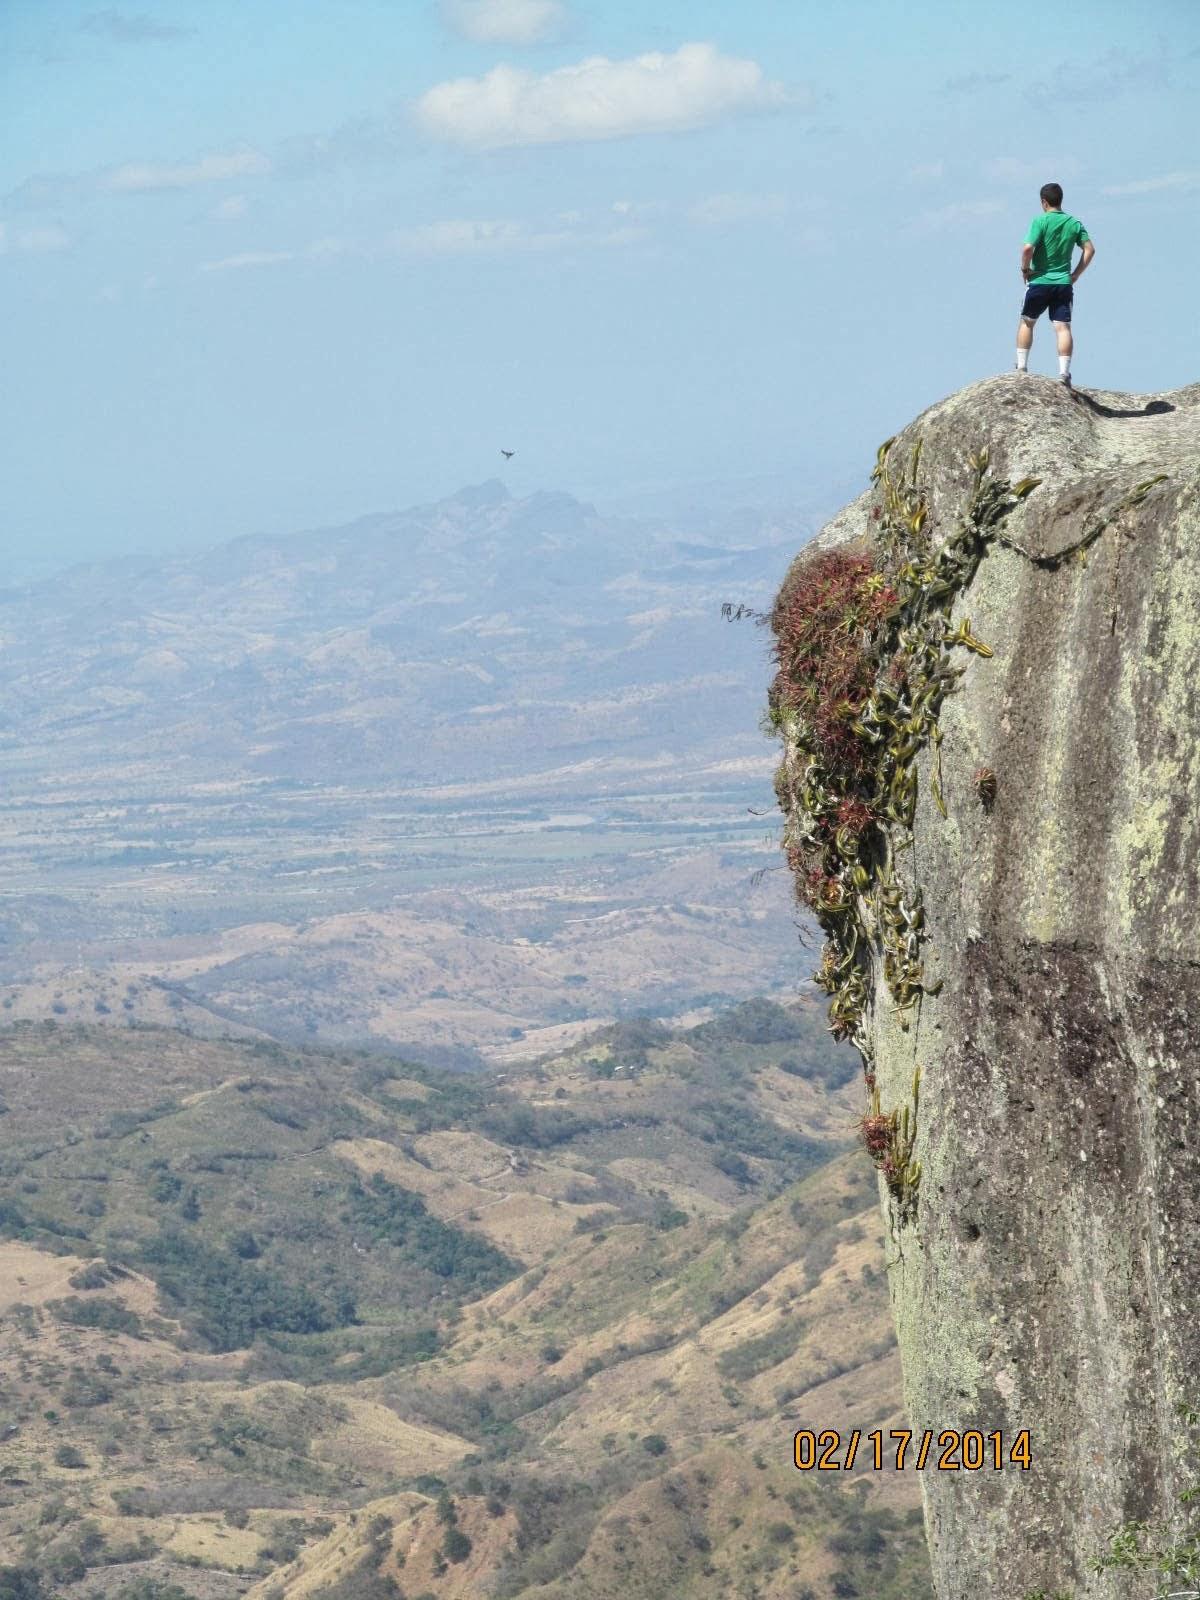 Mount Peña